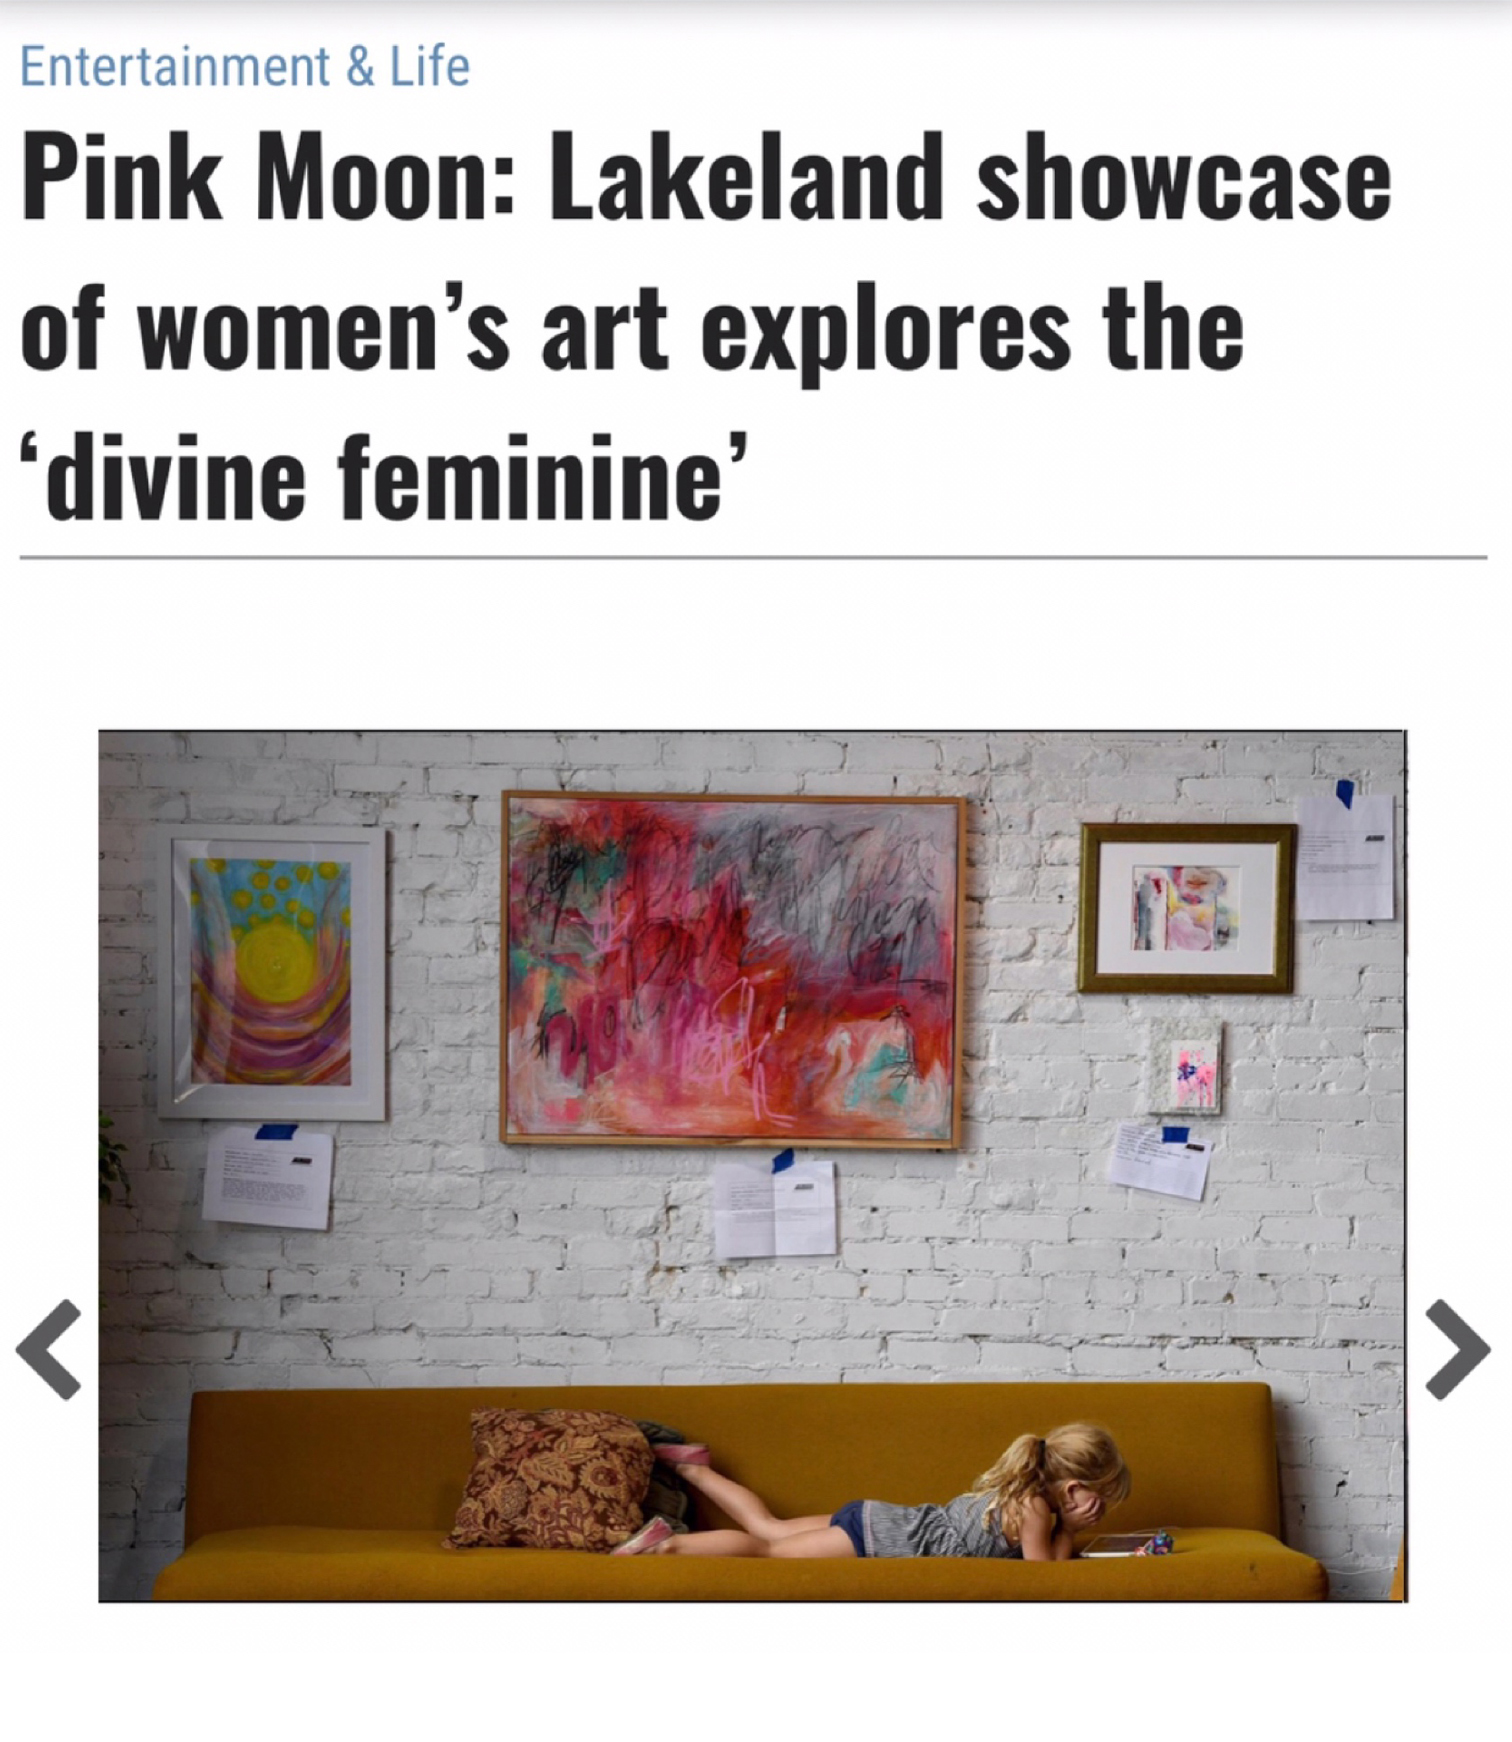 sheila-burgos-pink-moon-diosas-theledger.jpg